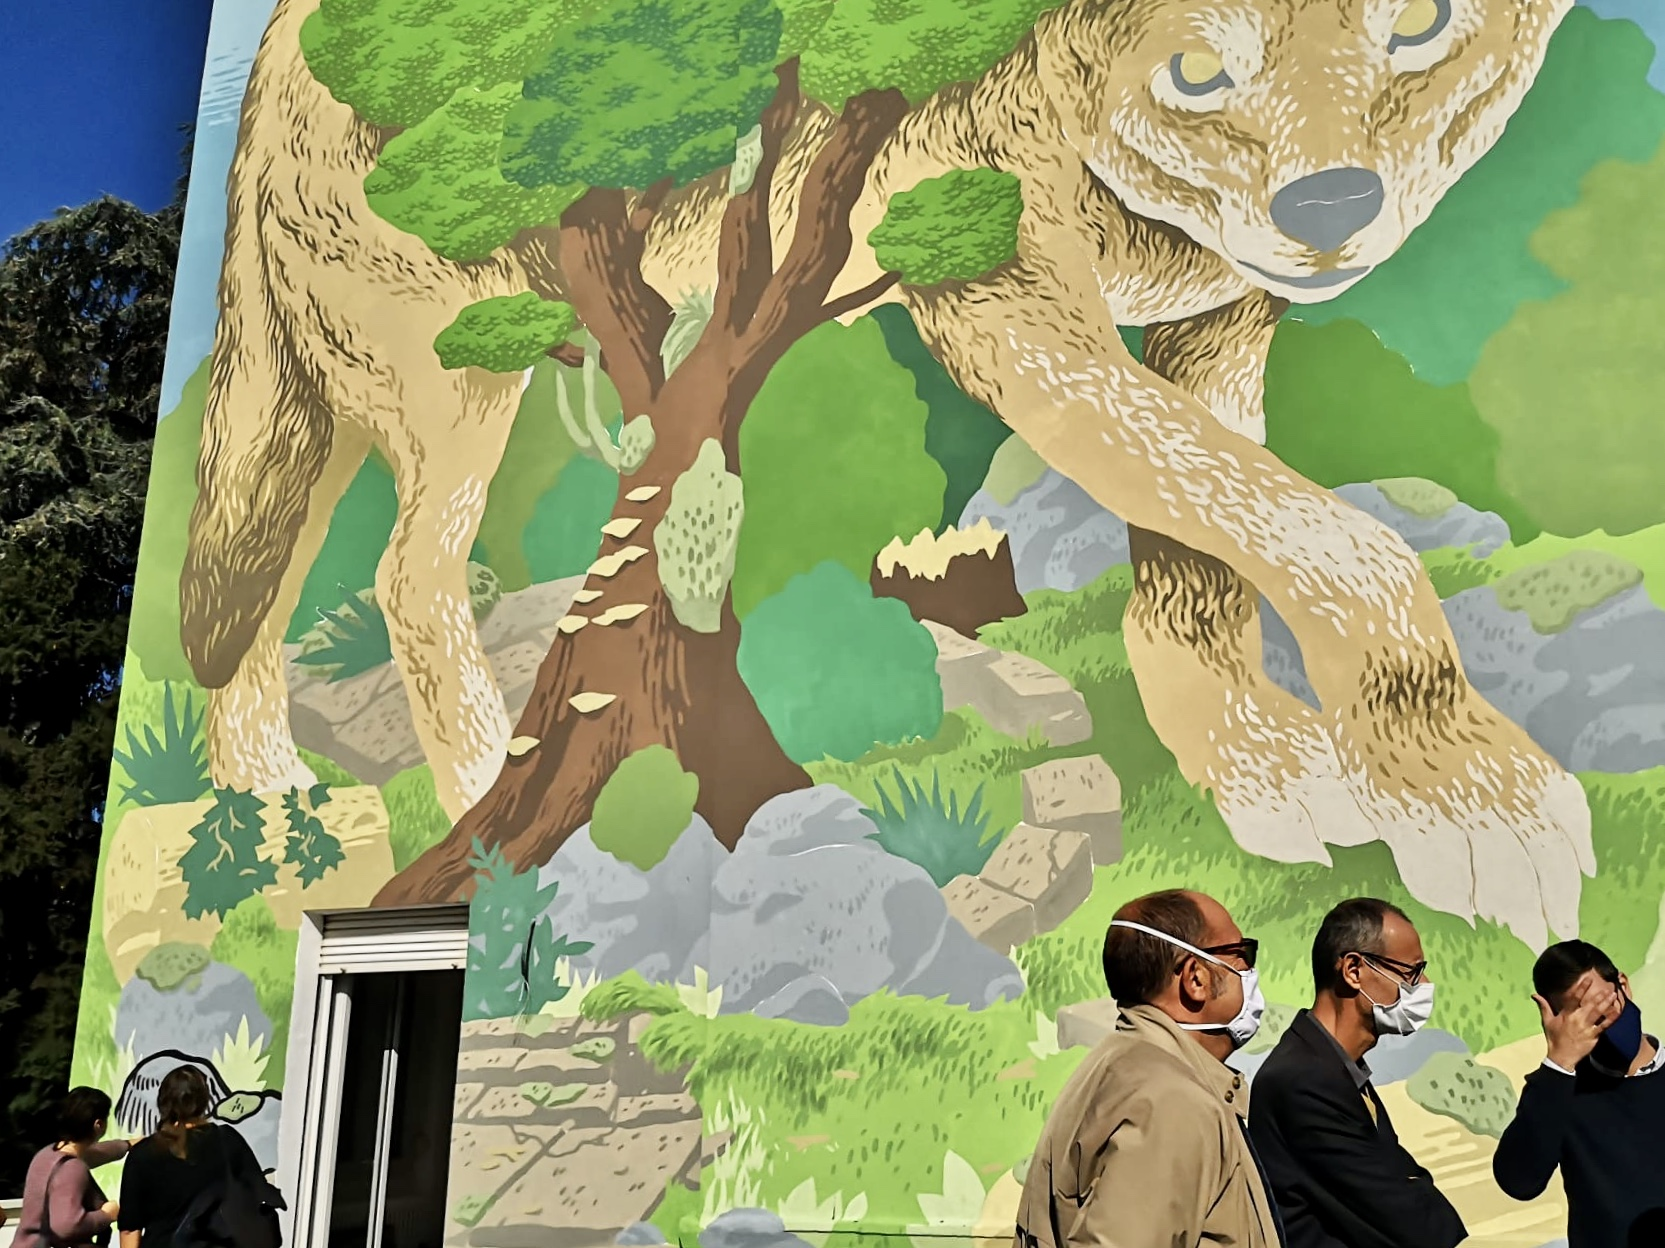 murale lupo Milano Lucamaleonte